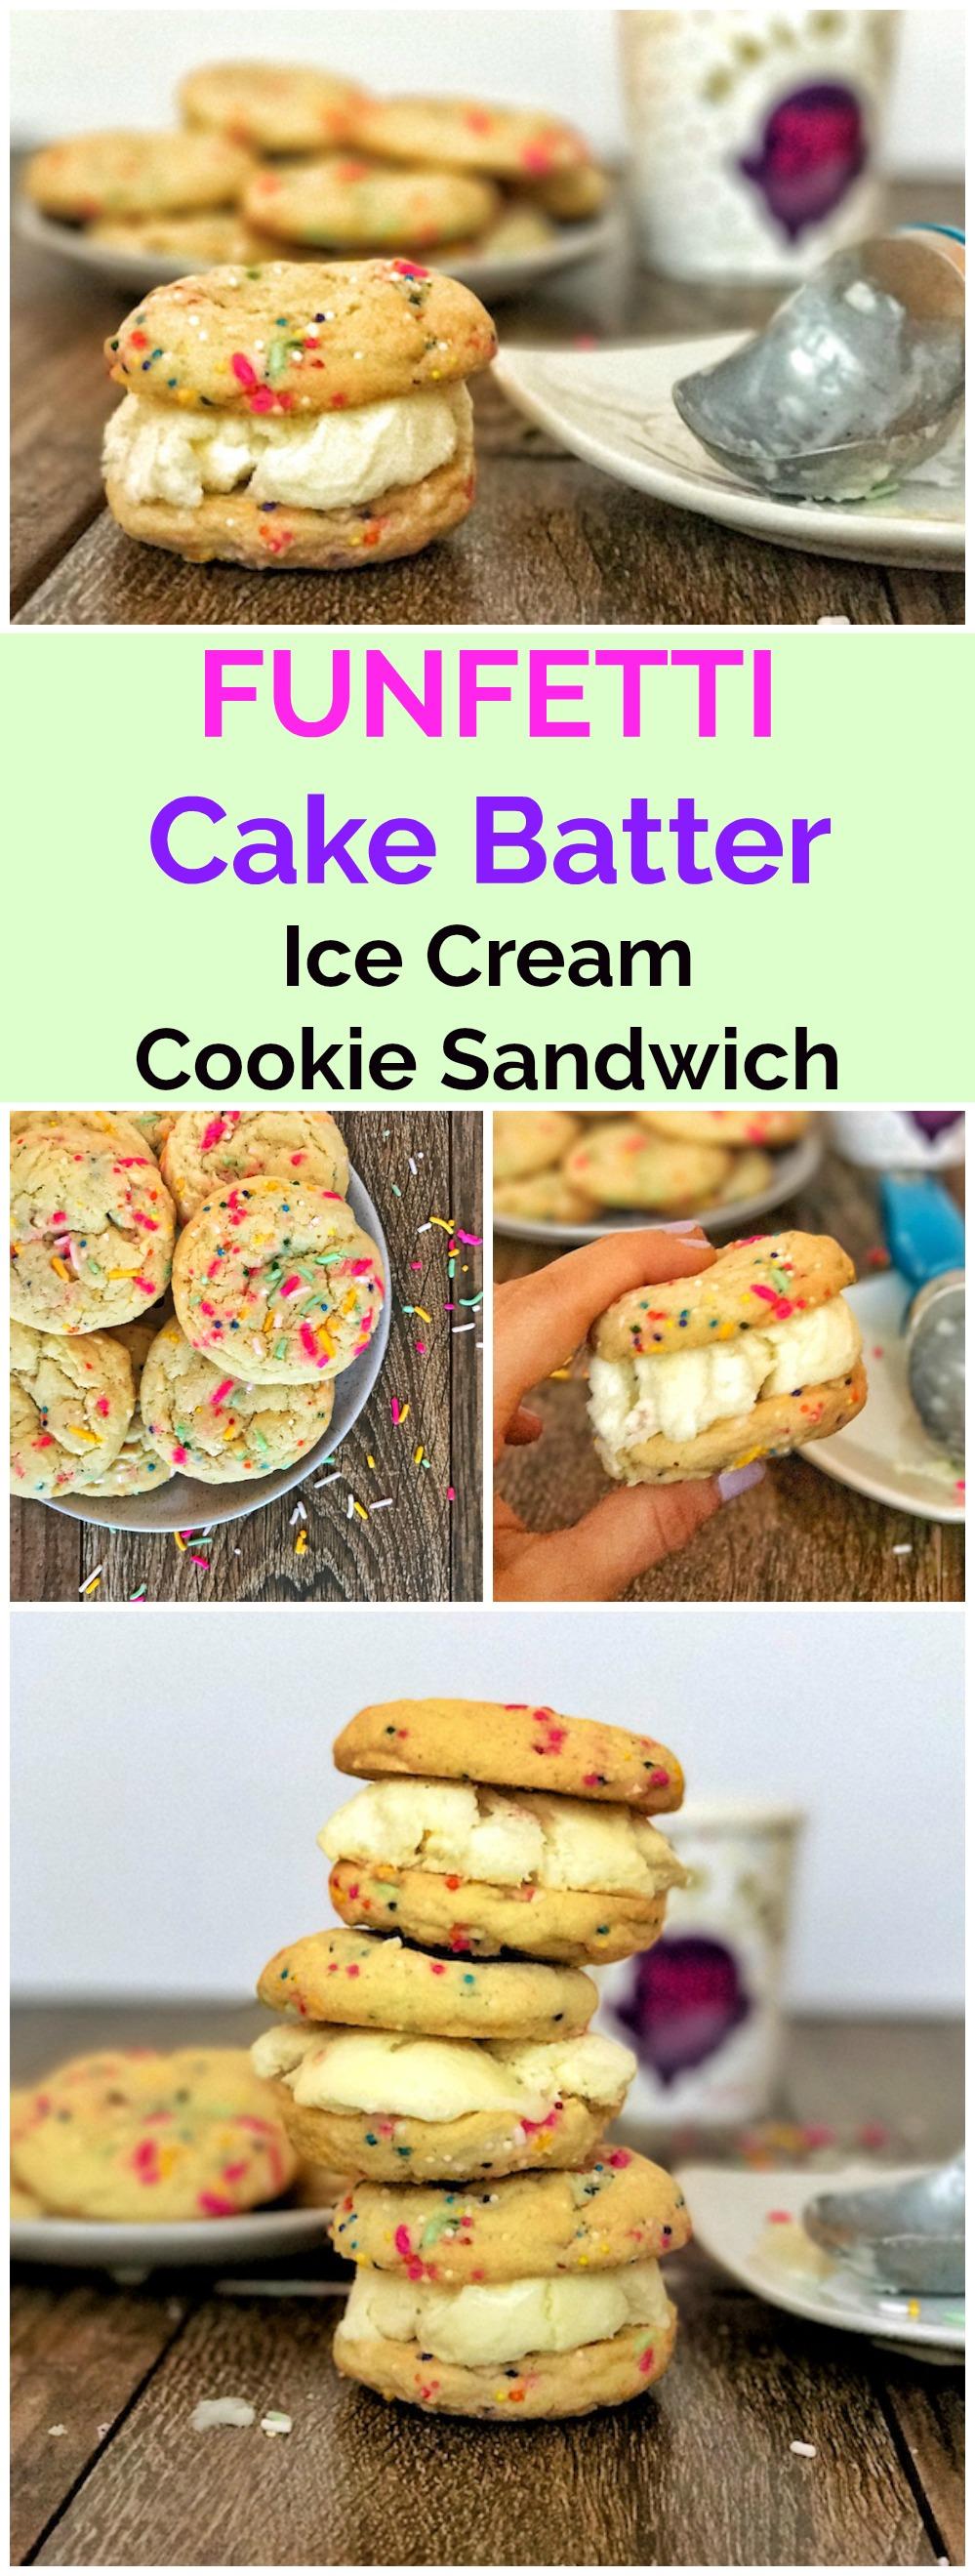 Funfetti Cake Batter Ice Cream Cookie Sandwiches Pin